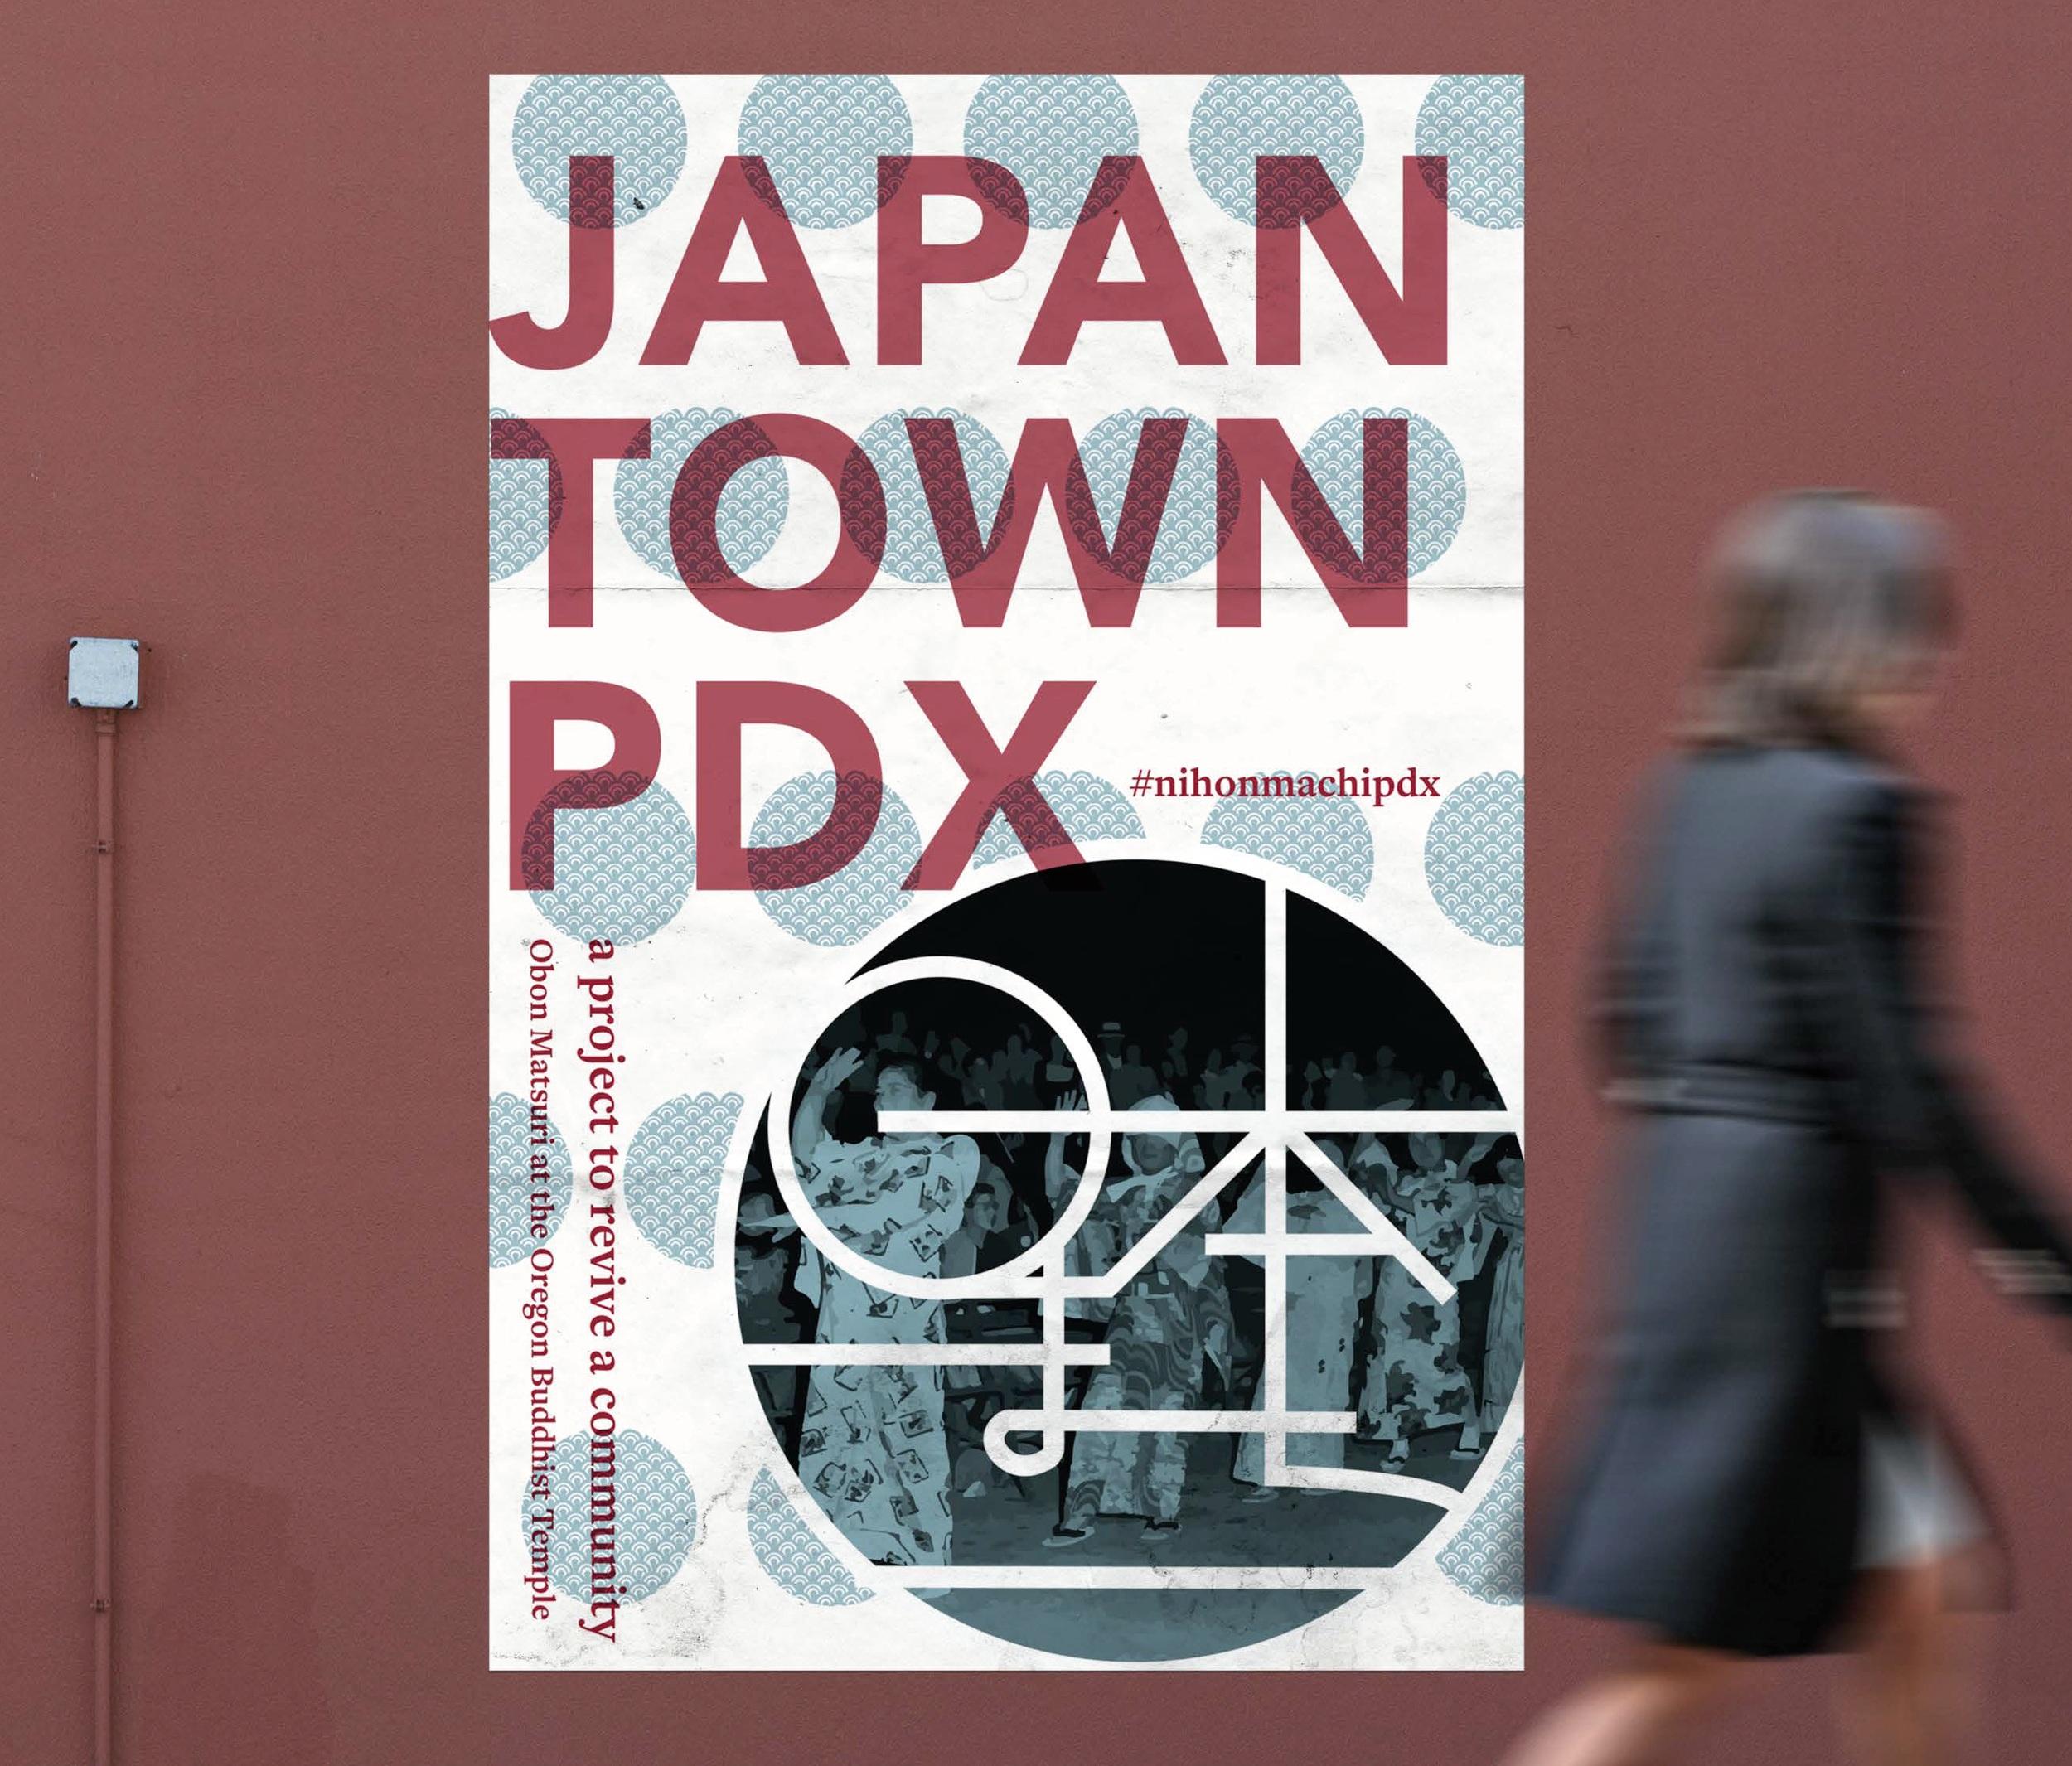 Poster (Obon Matsuri version)